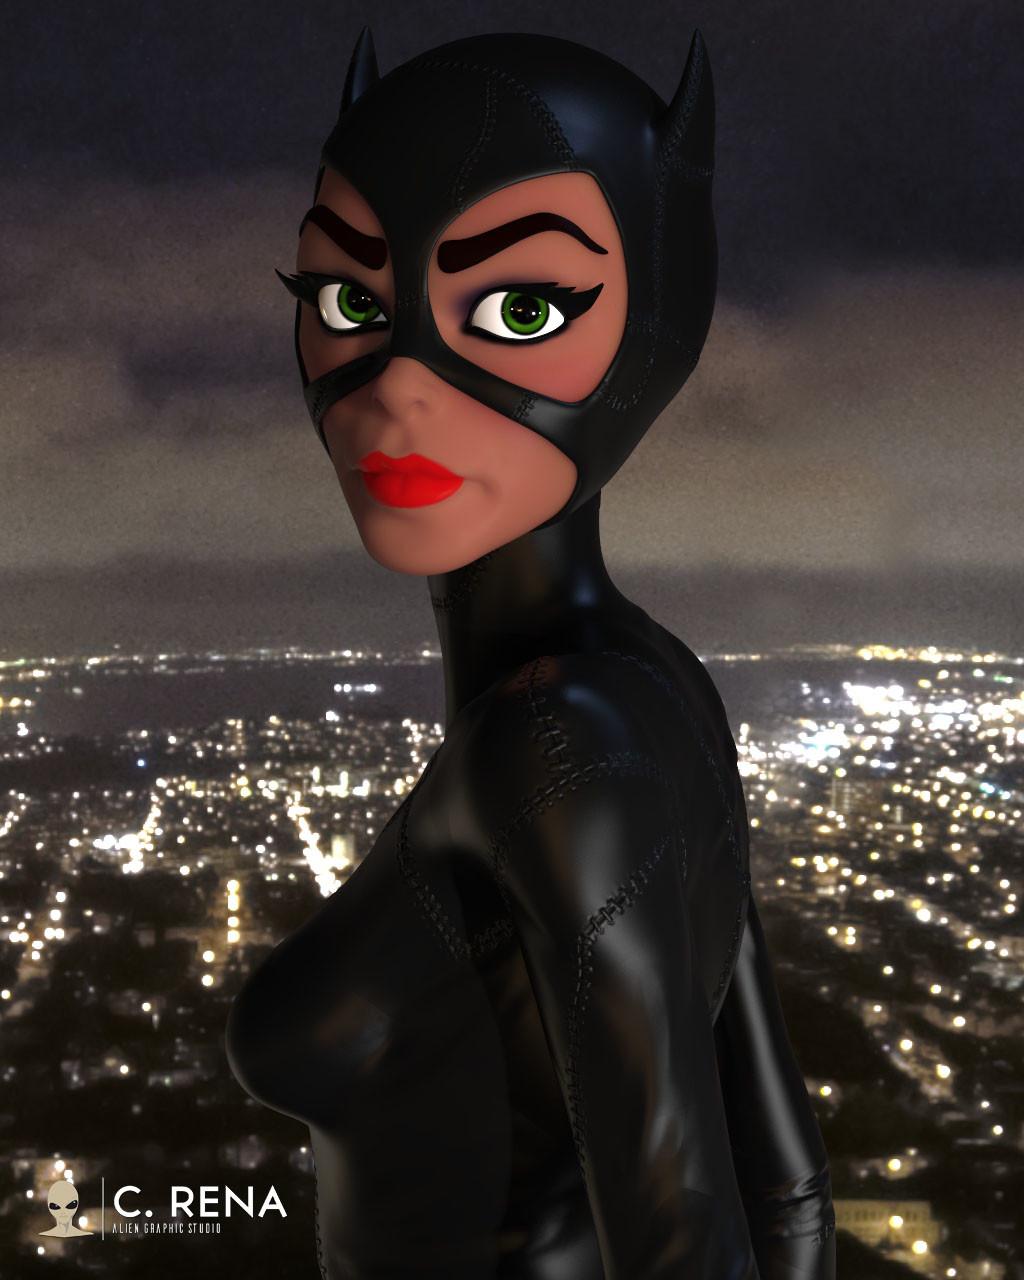 Chris rena catwoman keyshot